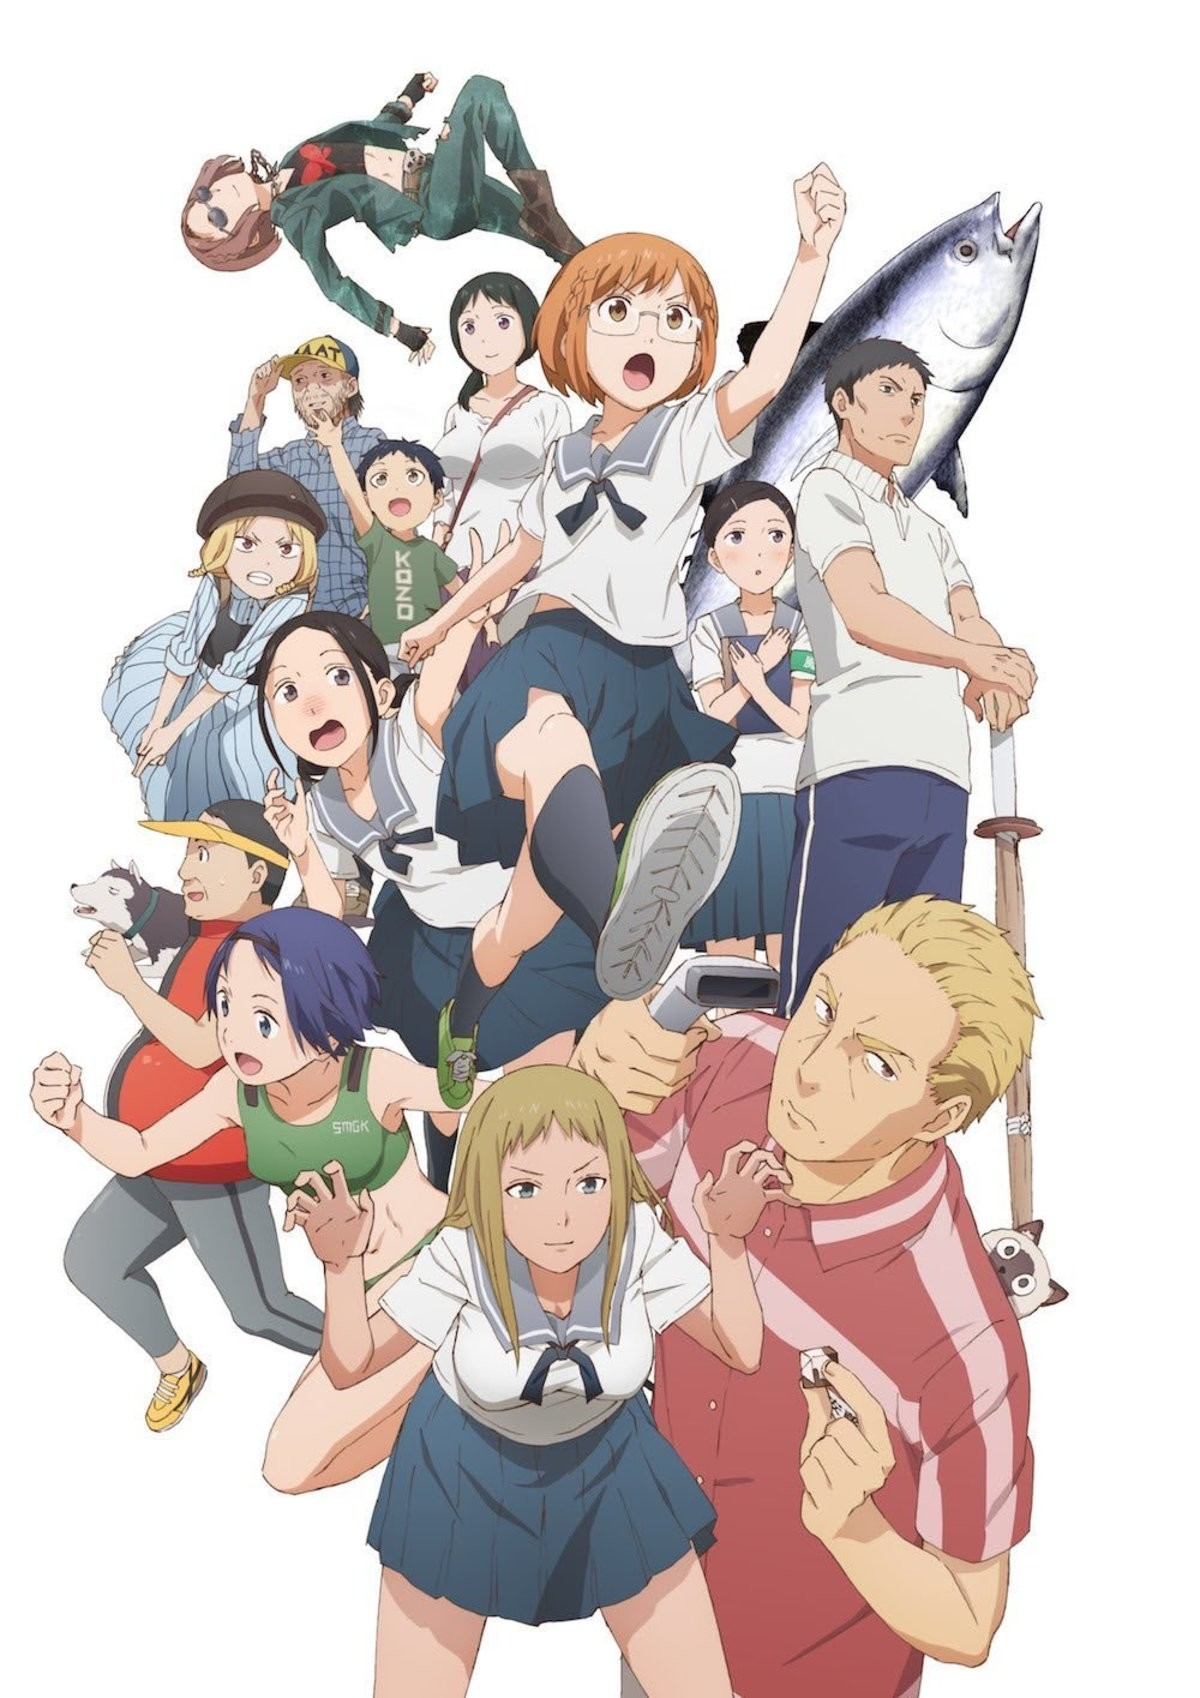 Satania Is Back This Anime Season!?. well sort of Chio chan no tsuugakuro same main va as satania and even looks similar About a unsociable girl going to school